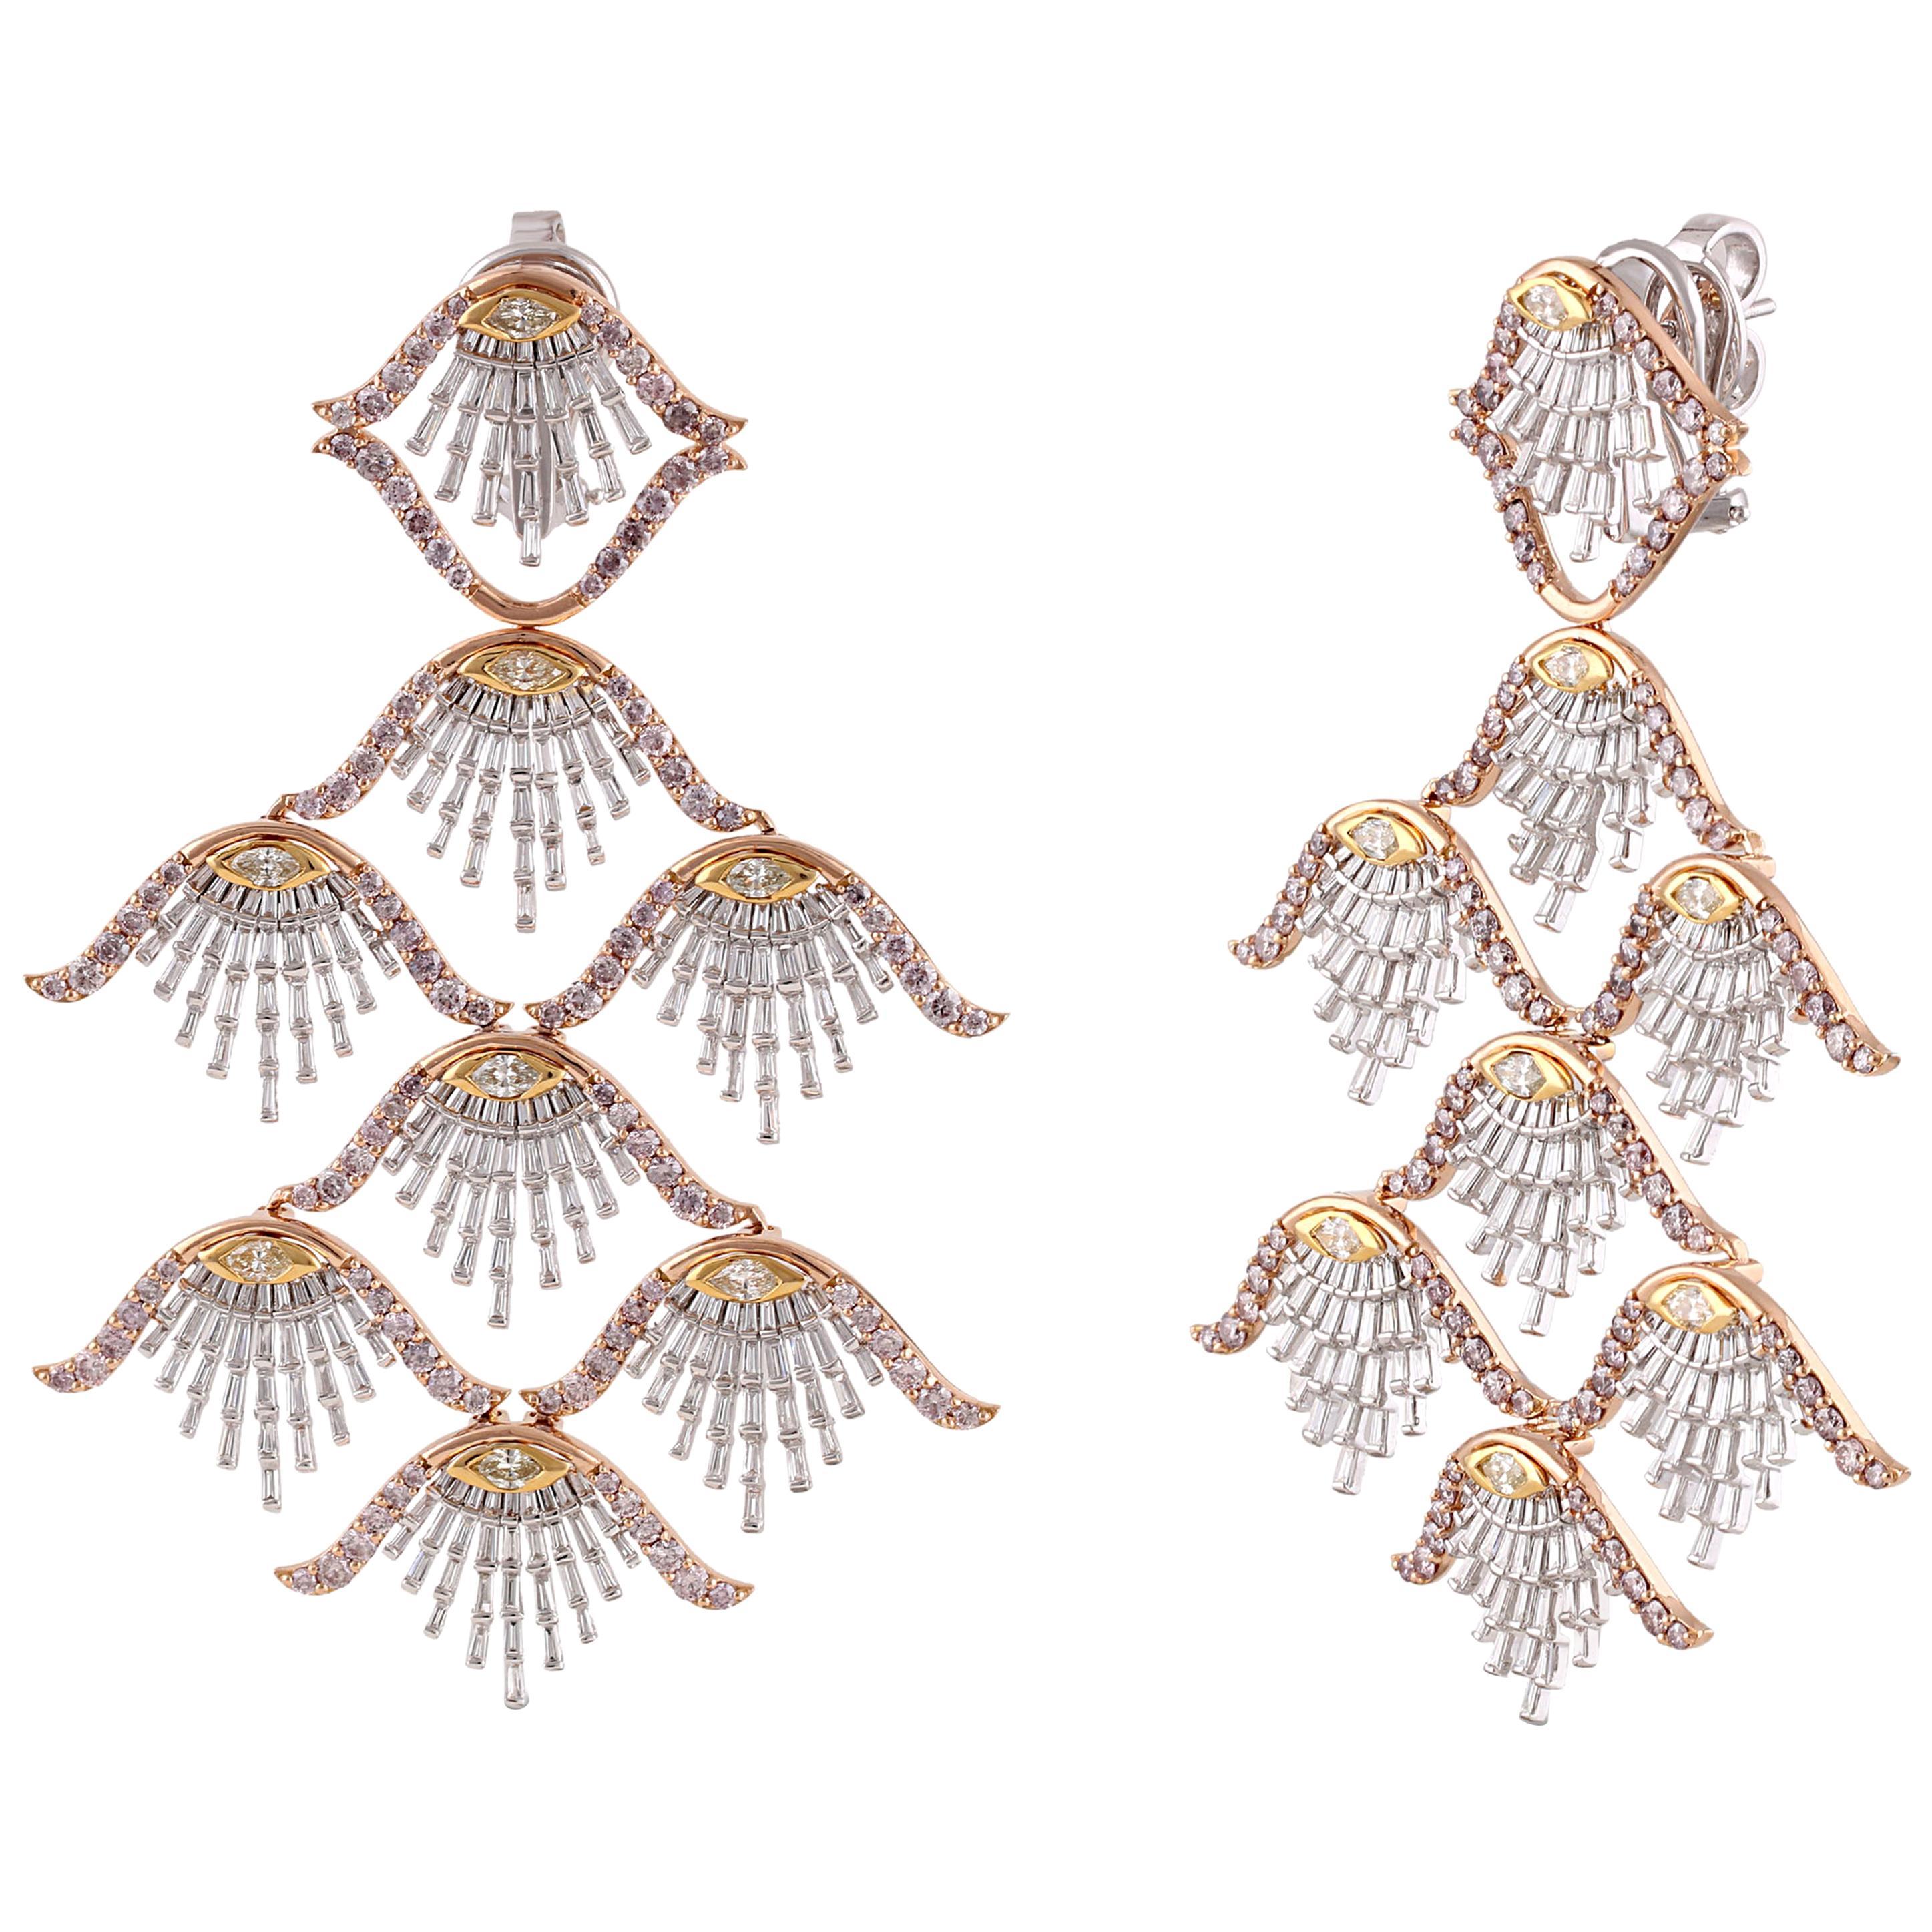 Studio Rêves Diamond Shell Dangling Earrings in 18 Karat Gold